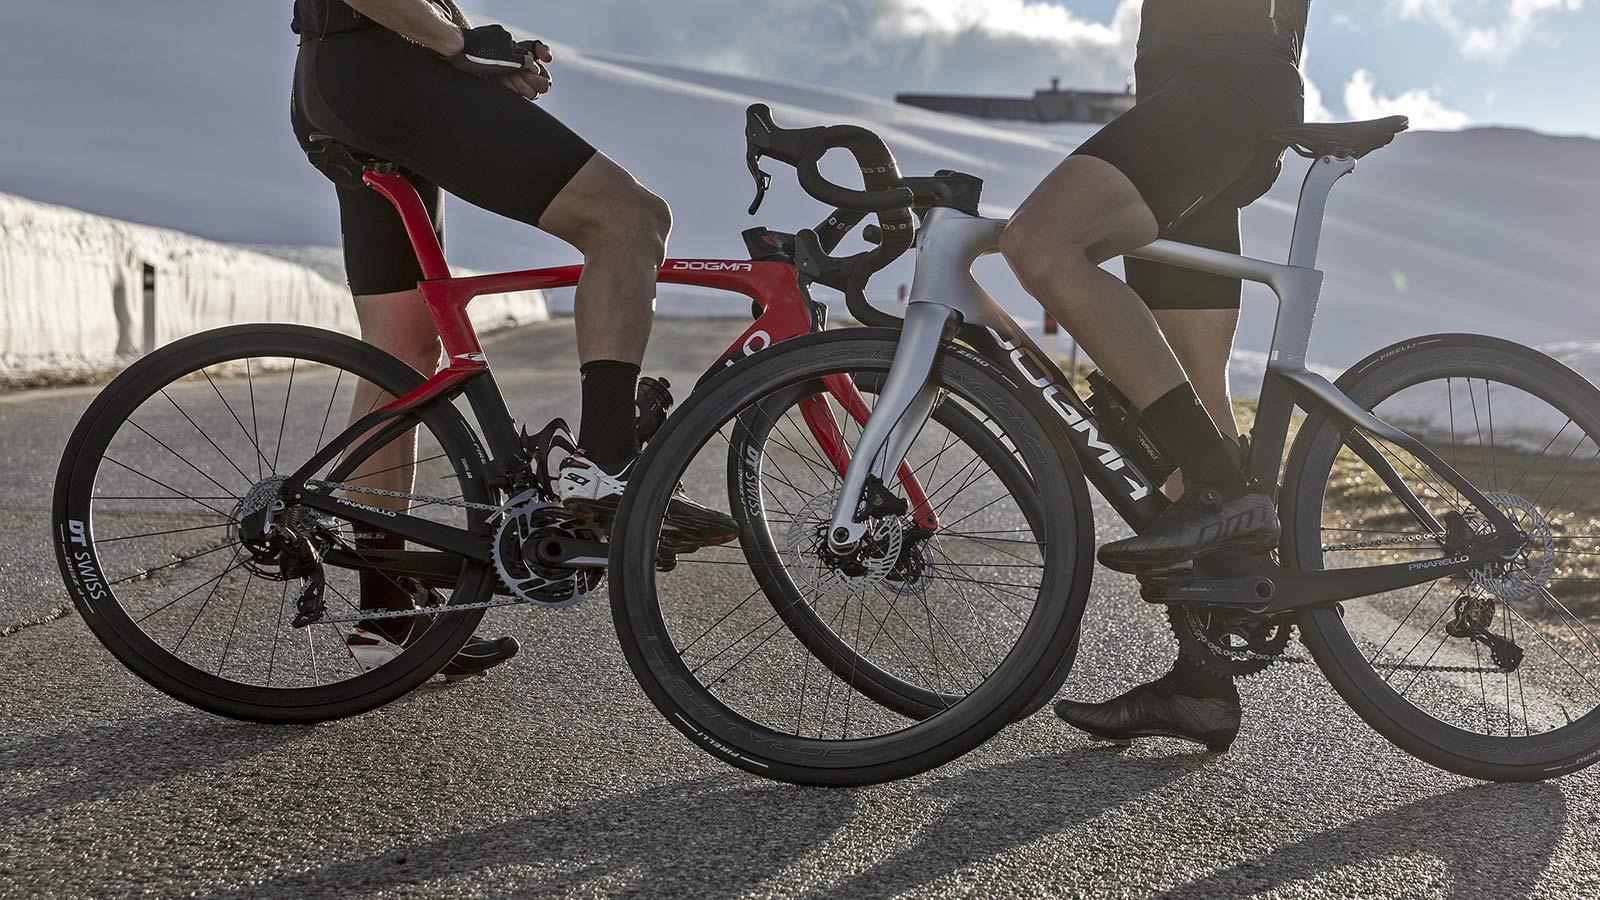 2022 Pinarello Dogma F curvy aero carbon road race bike, disc brake